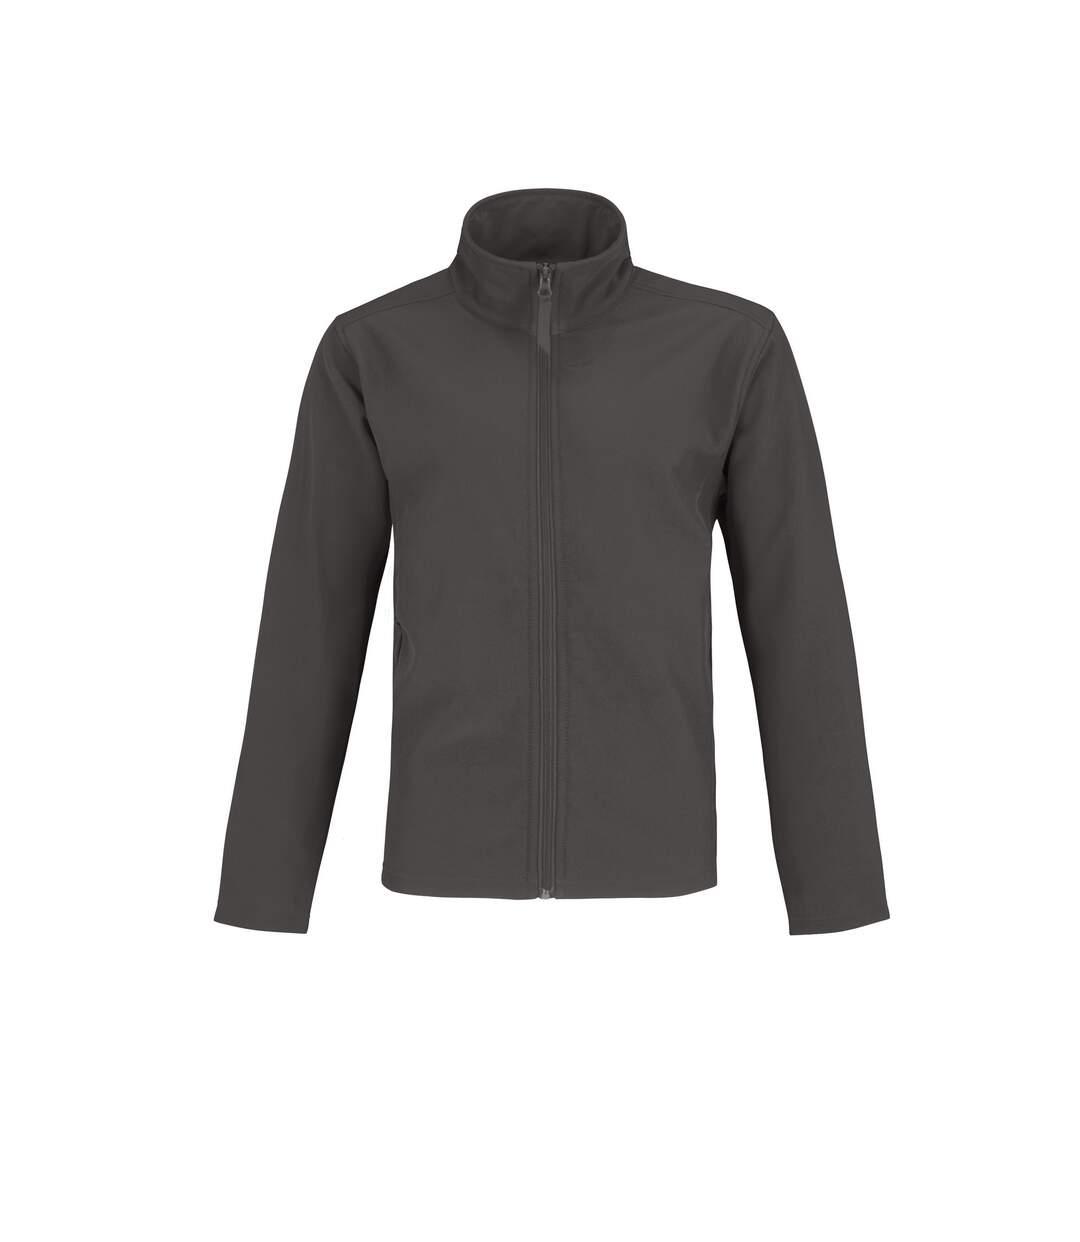 B&C Mens Two Layer Water Repellent Softshell Jacket (Dark Grey/ Neon Orange) - UTRW4835